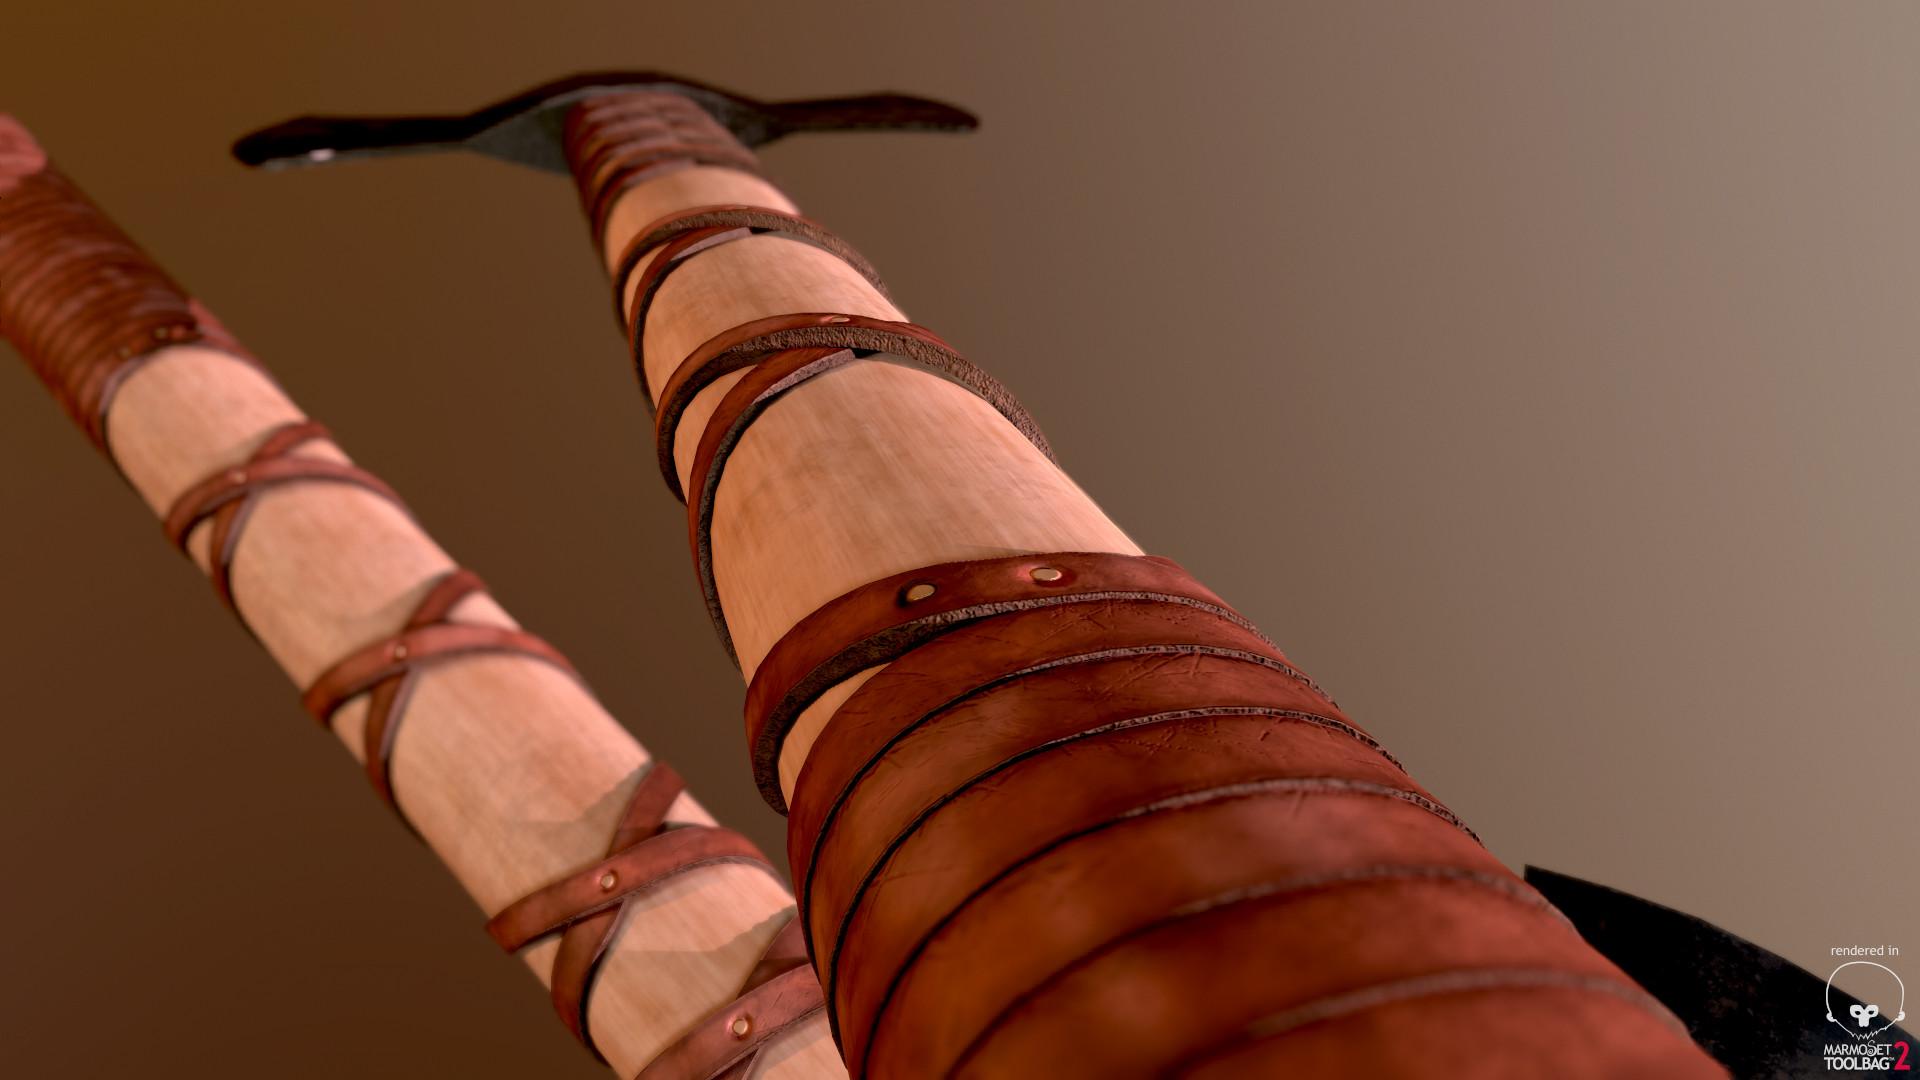 Bela csampai two headed viking axe preview mt 05